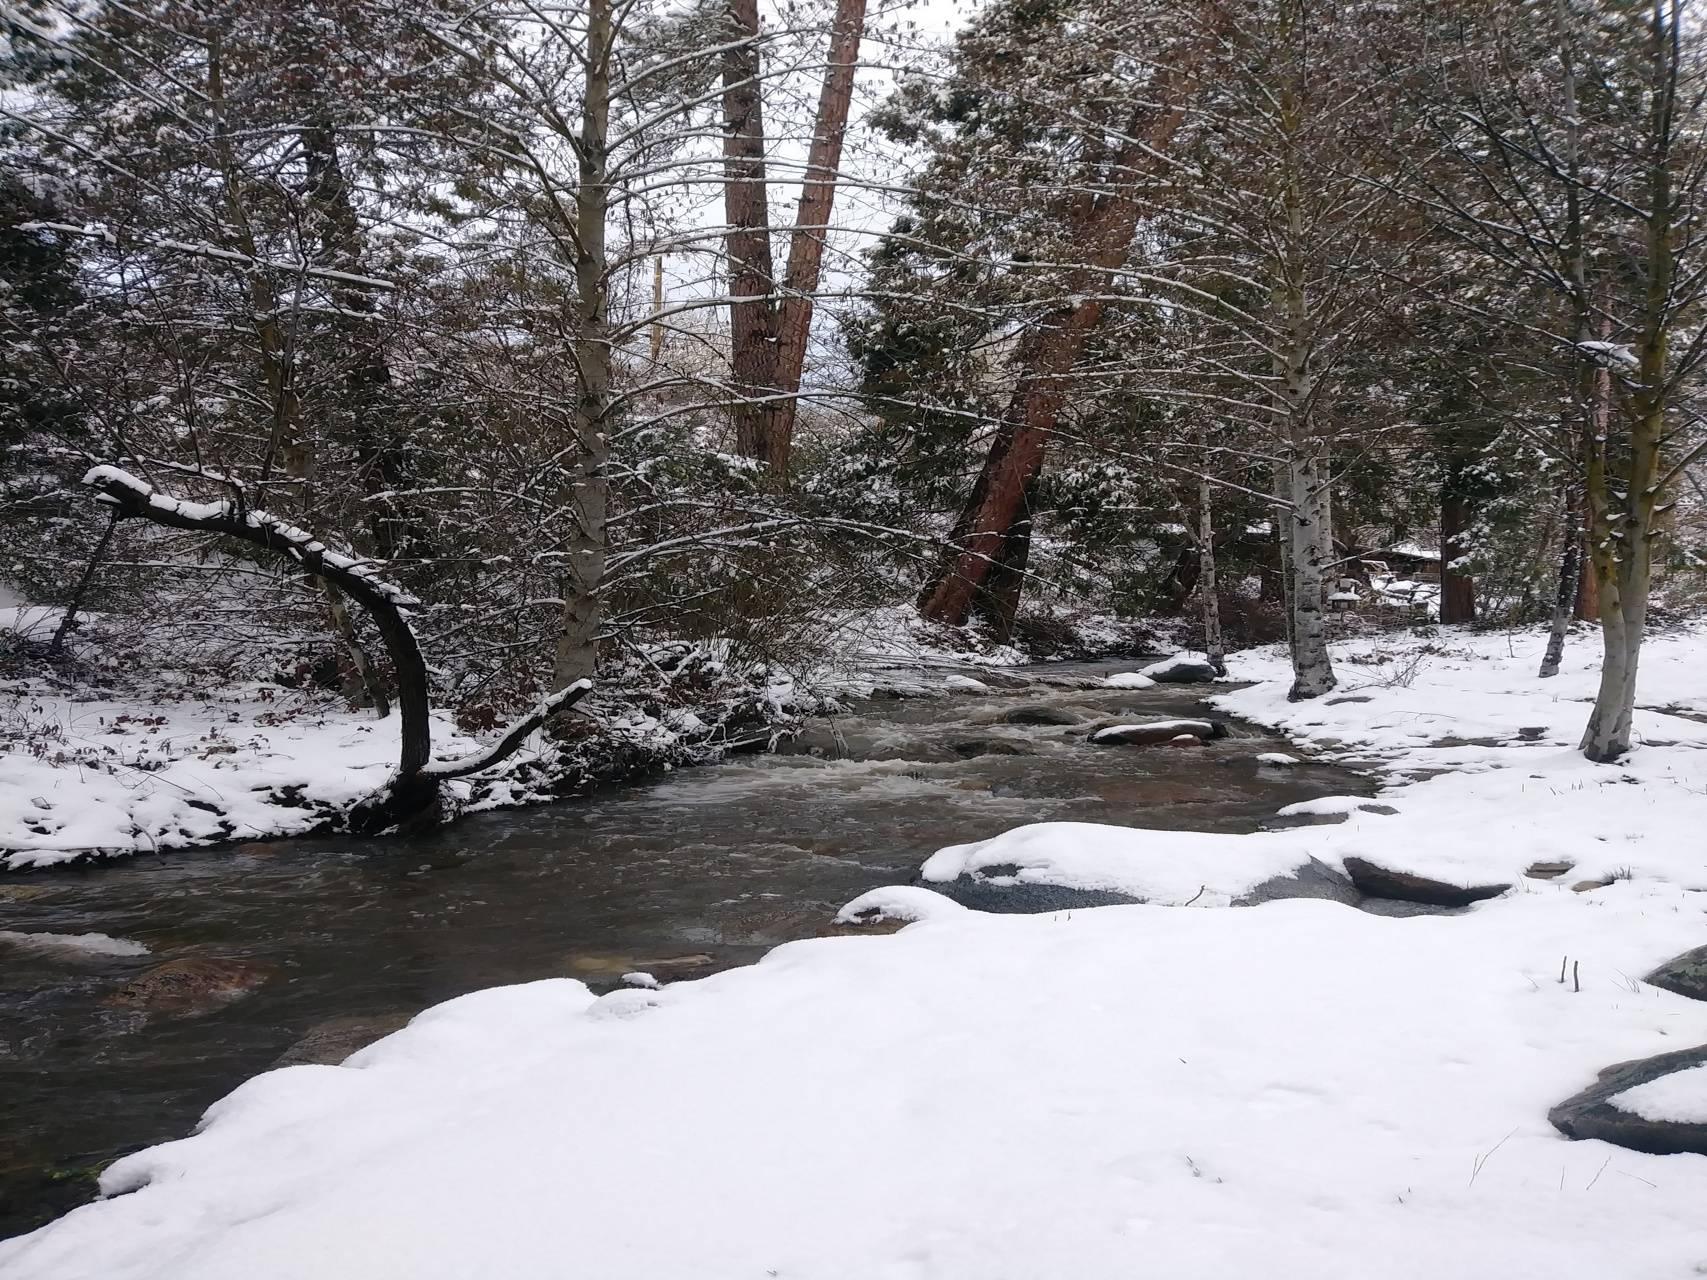 Snow along the creek